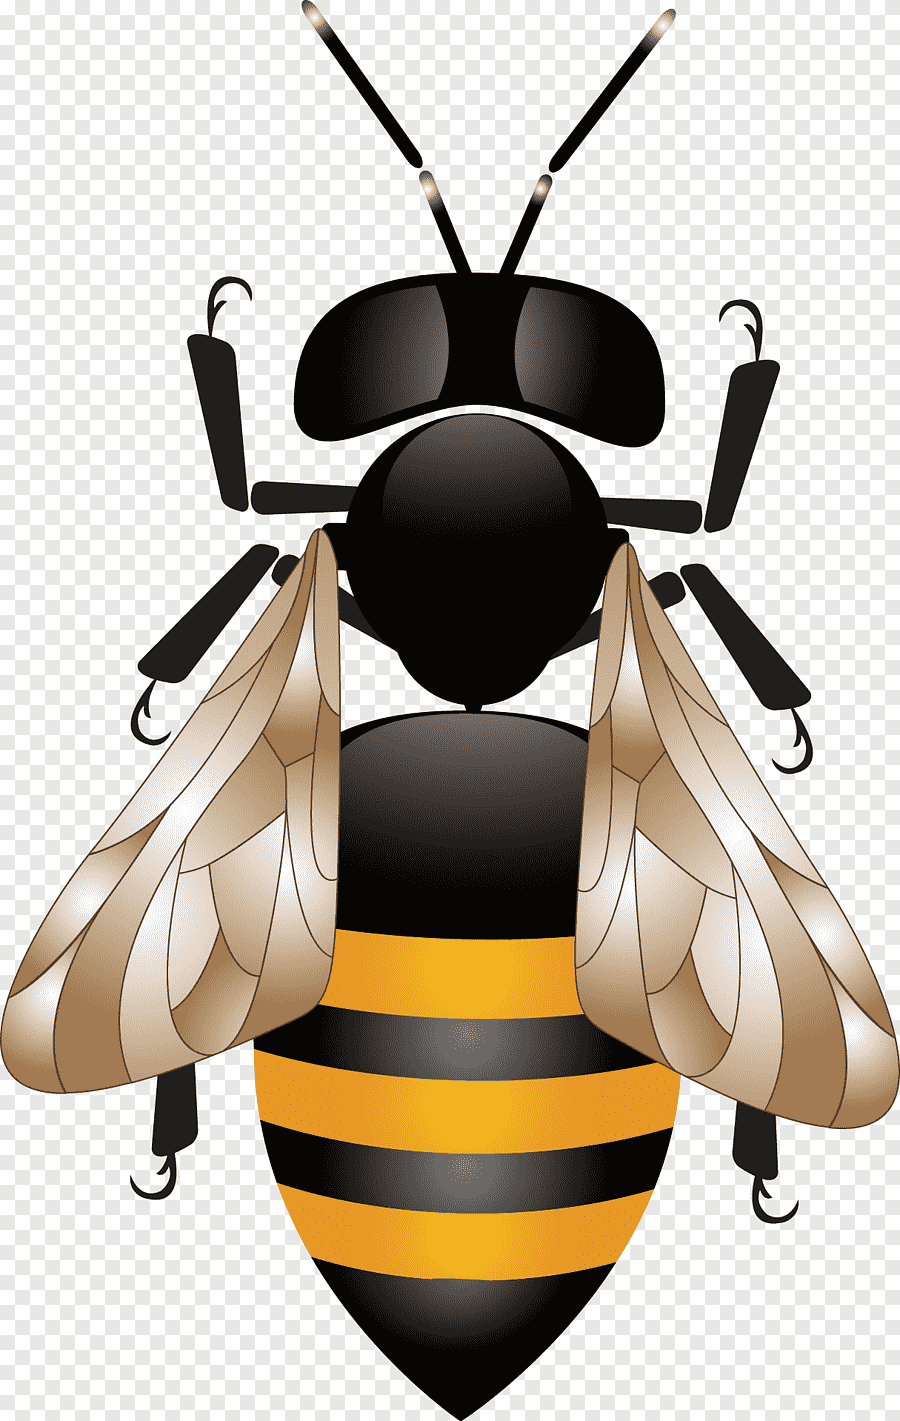 Sarang Tawon Vector : sarang, tawon, vector, Illustration,, Honey, Honeycomb, Beehive, Pattern,, Nest,, Animals,, Happy, Birthday, Vector, Images, PNGEgg